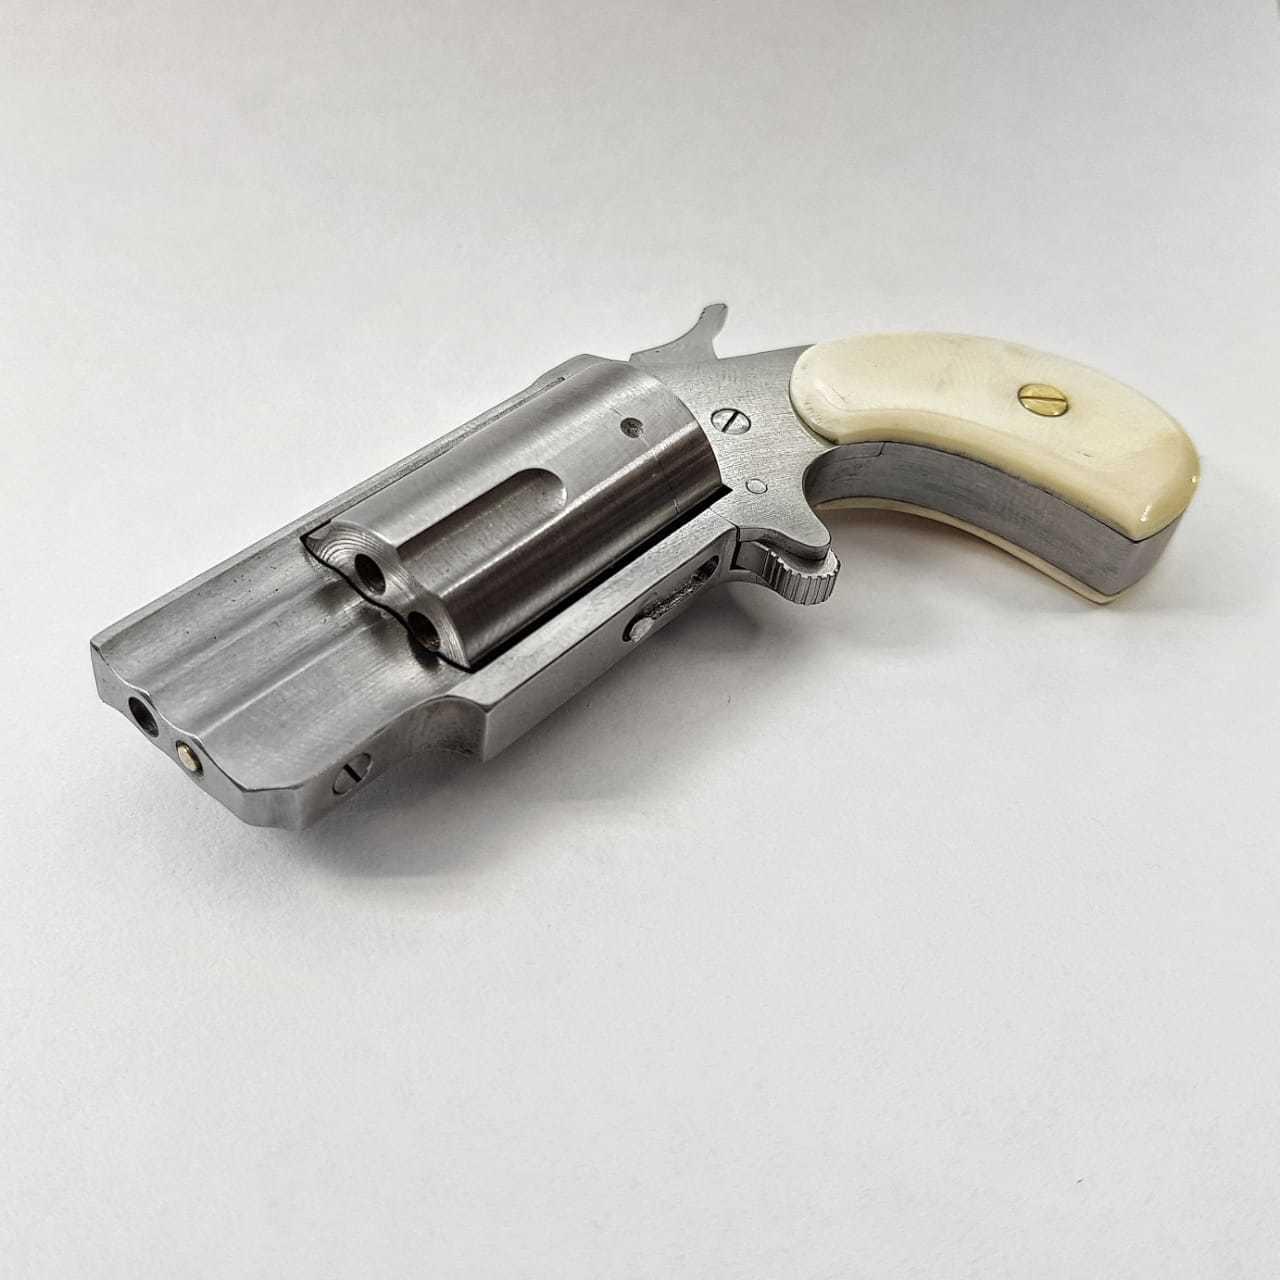 NAA PUG revolver ����������� 1